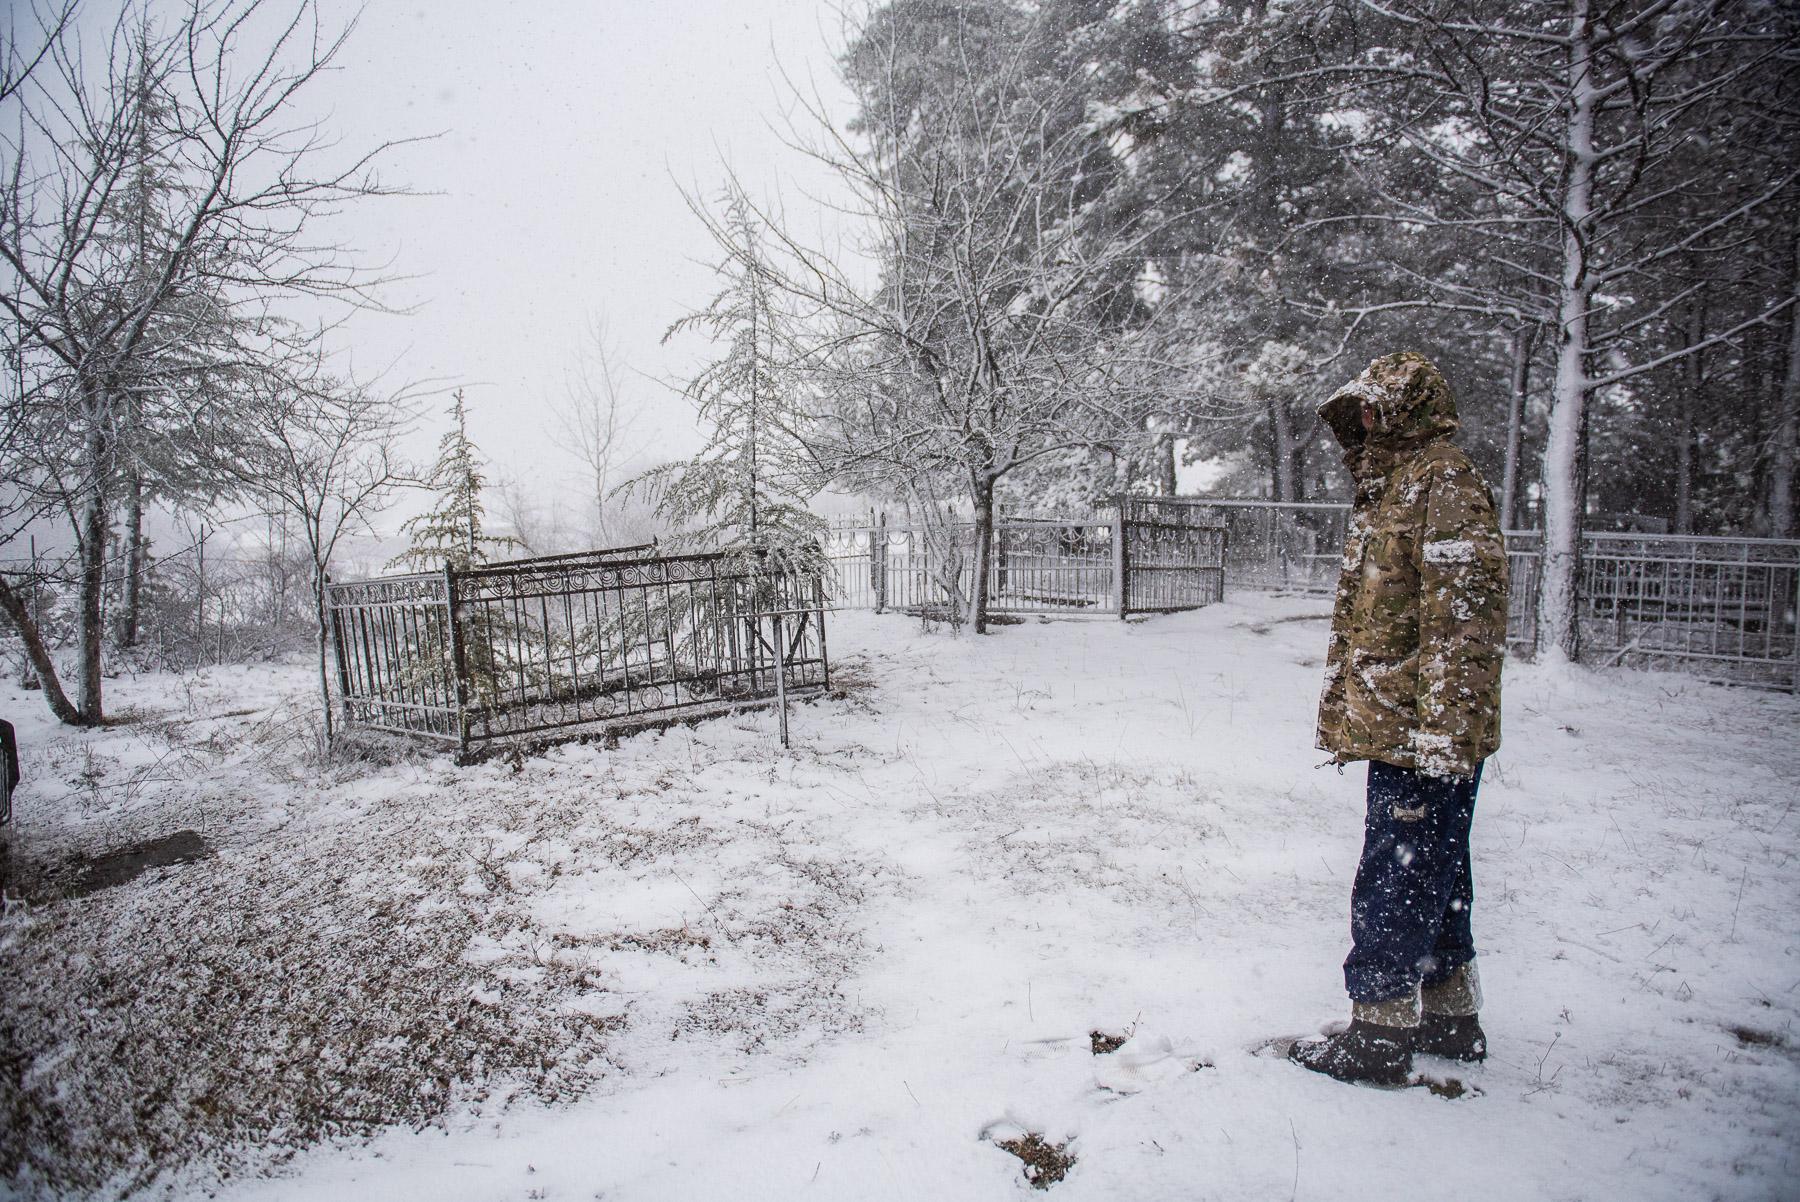 Levan Shekiladze shows graves that have been damaged in Shukruti. February 2020. Photo: Mariam Nikuradze/OC Media.